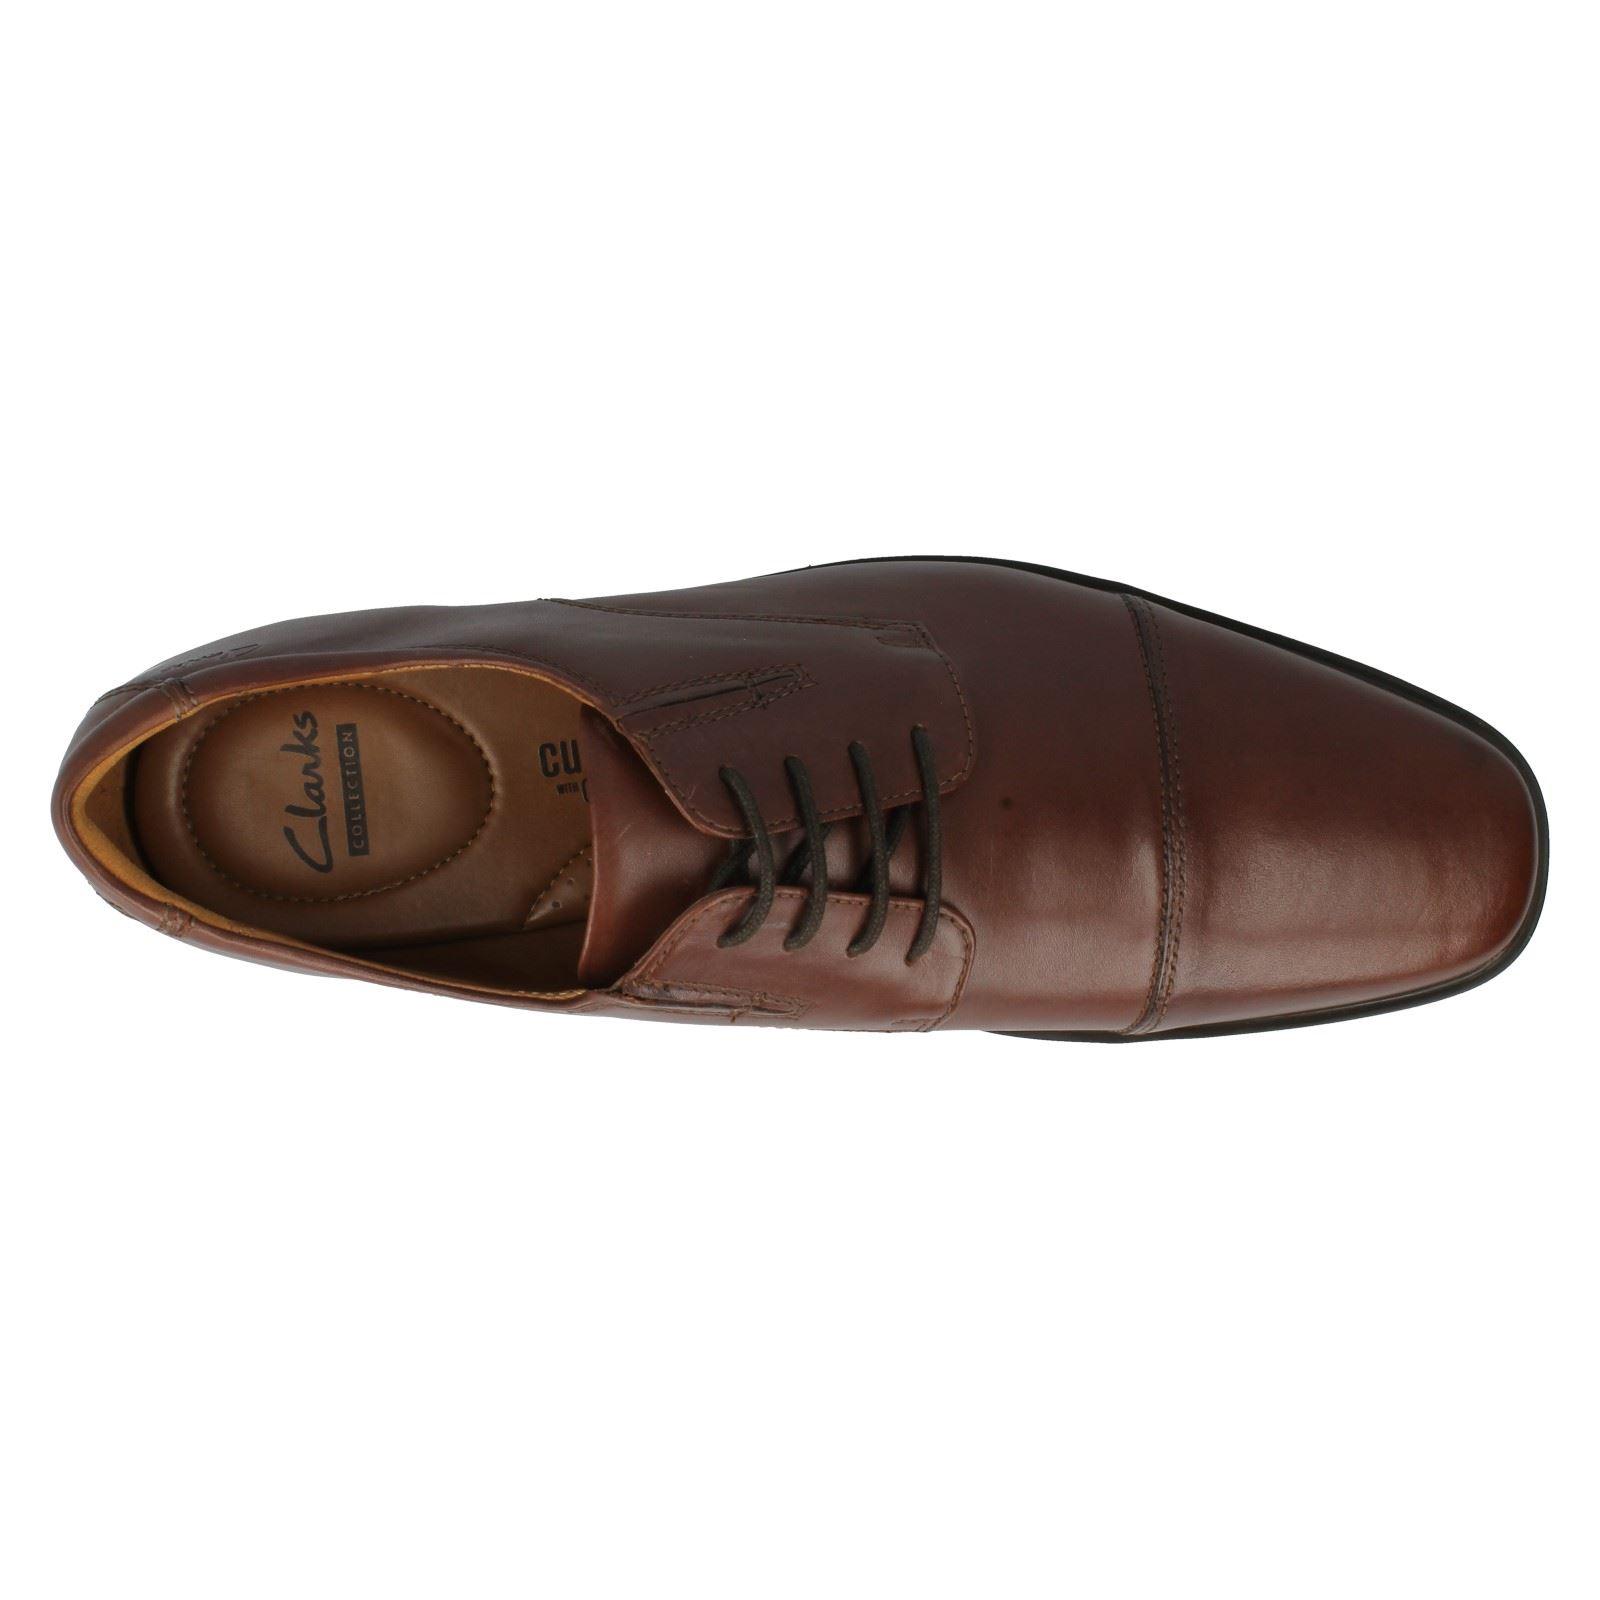 Clarks Shoes Turkey